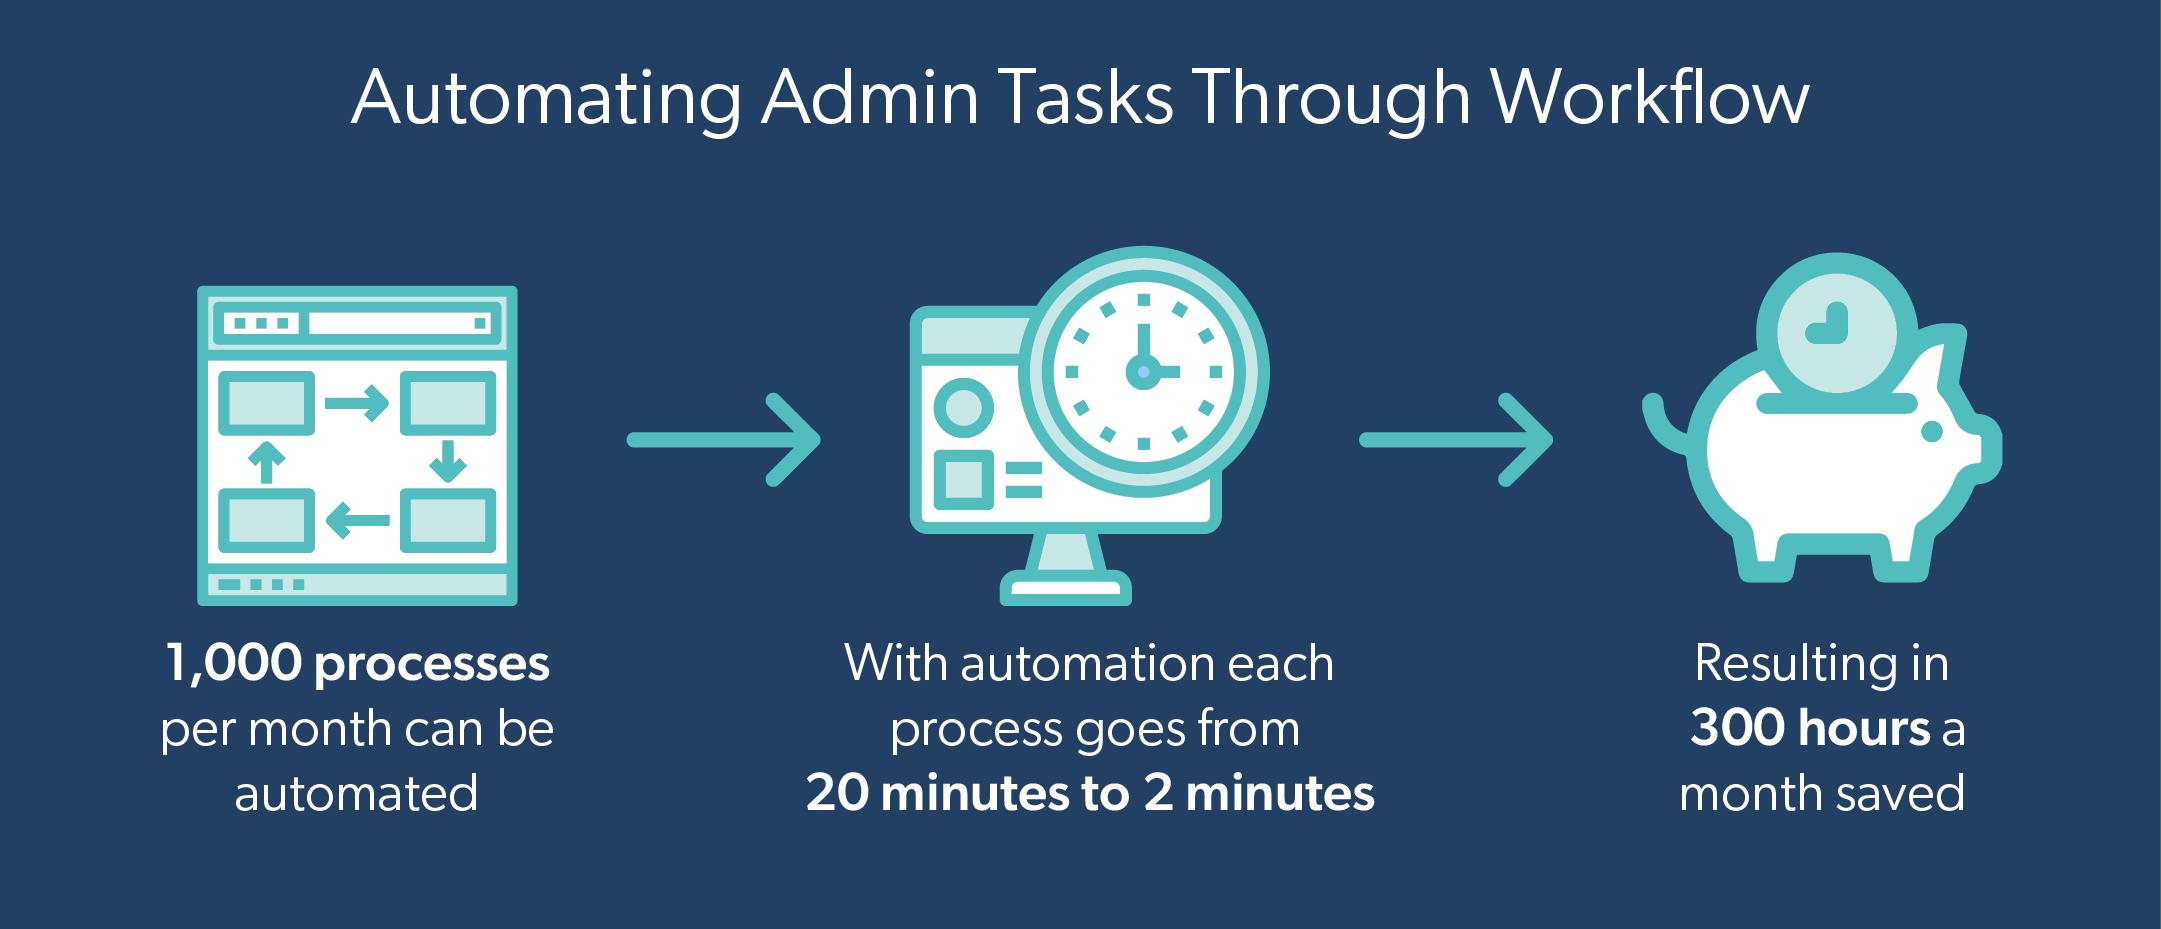 Steps around automating admin tasks through workflows